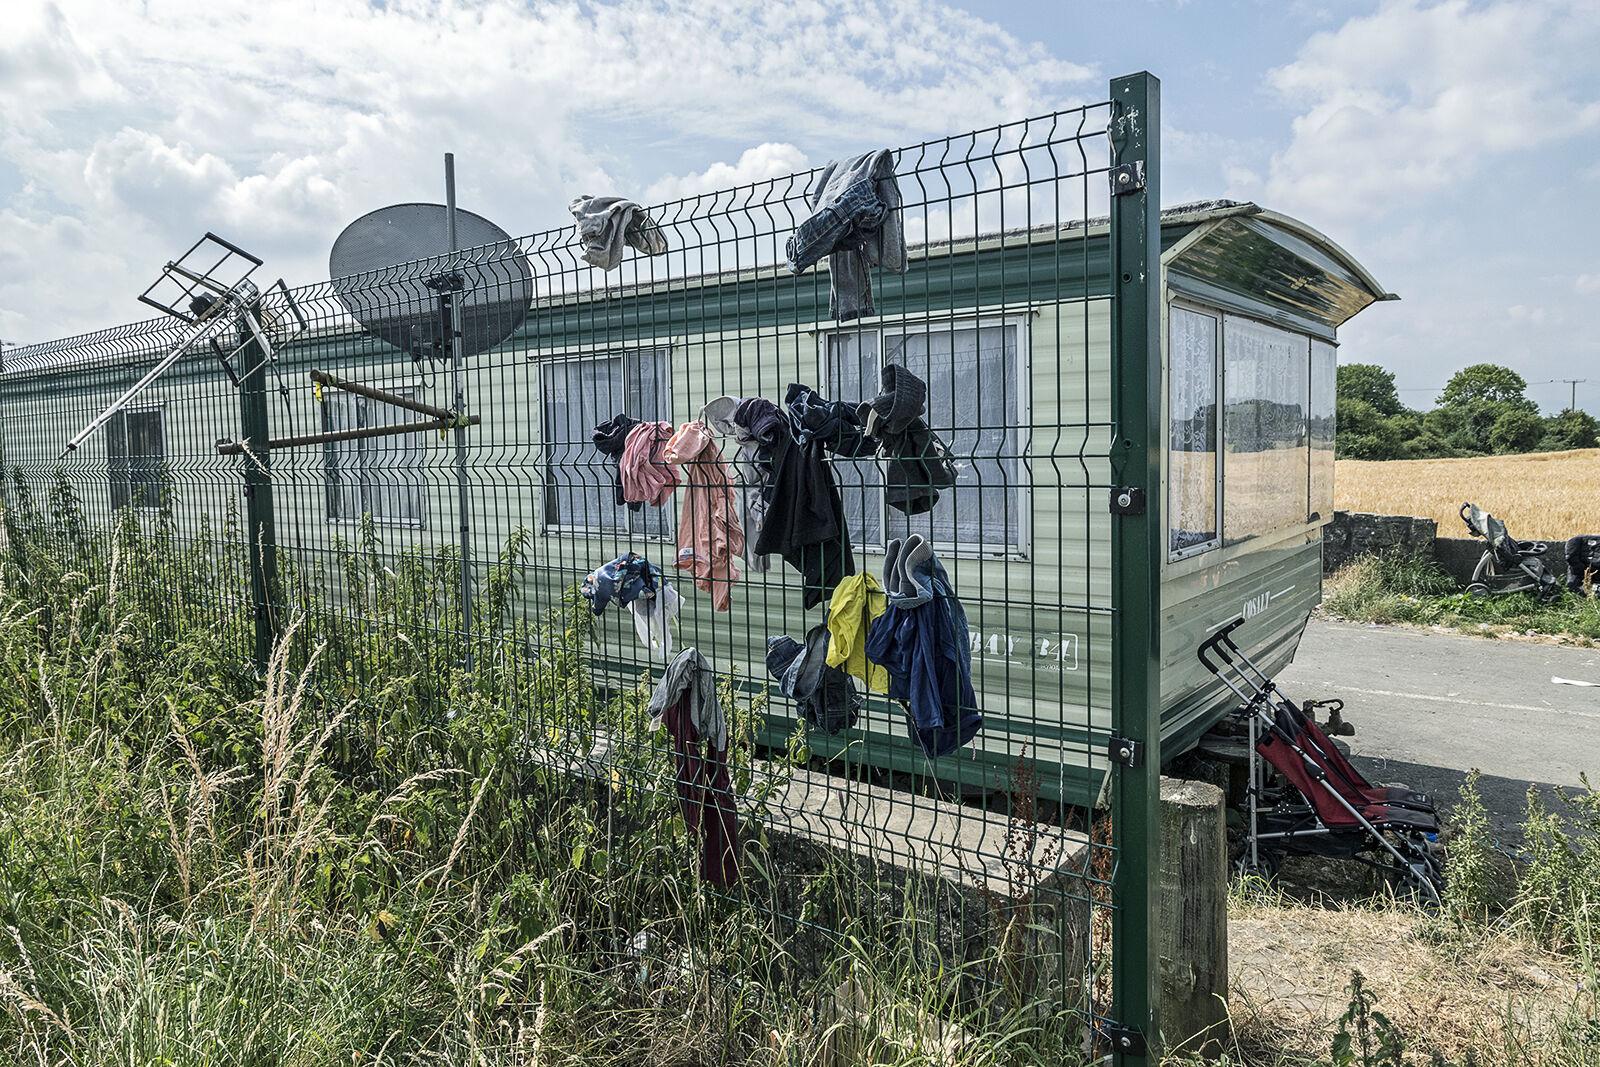 Reilly's Laundry, Tipperary, Ireland 2018